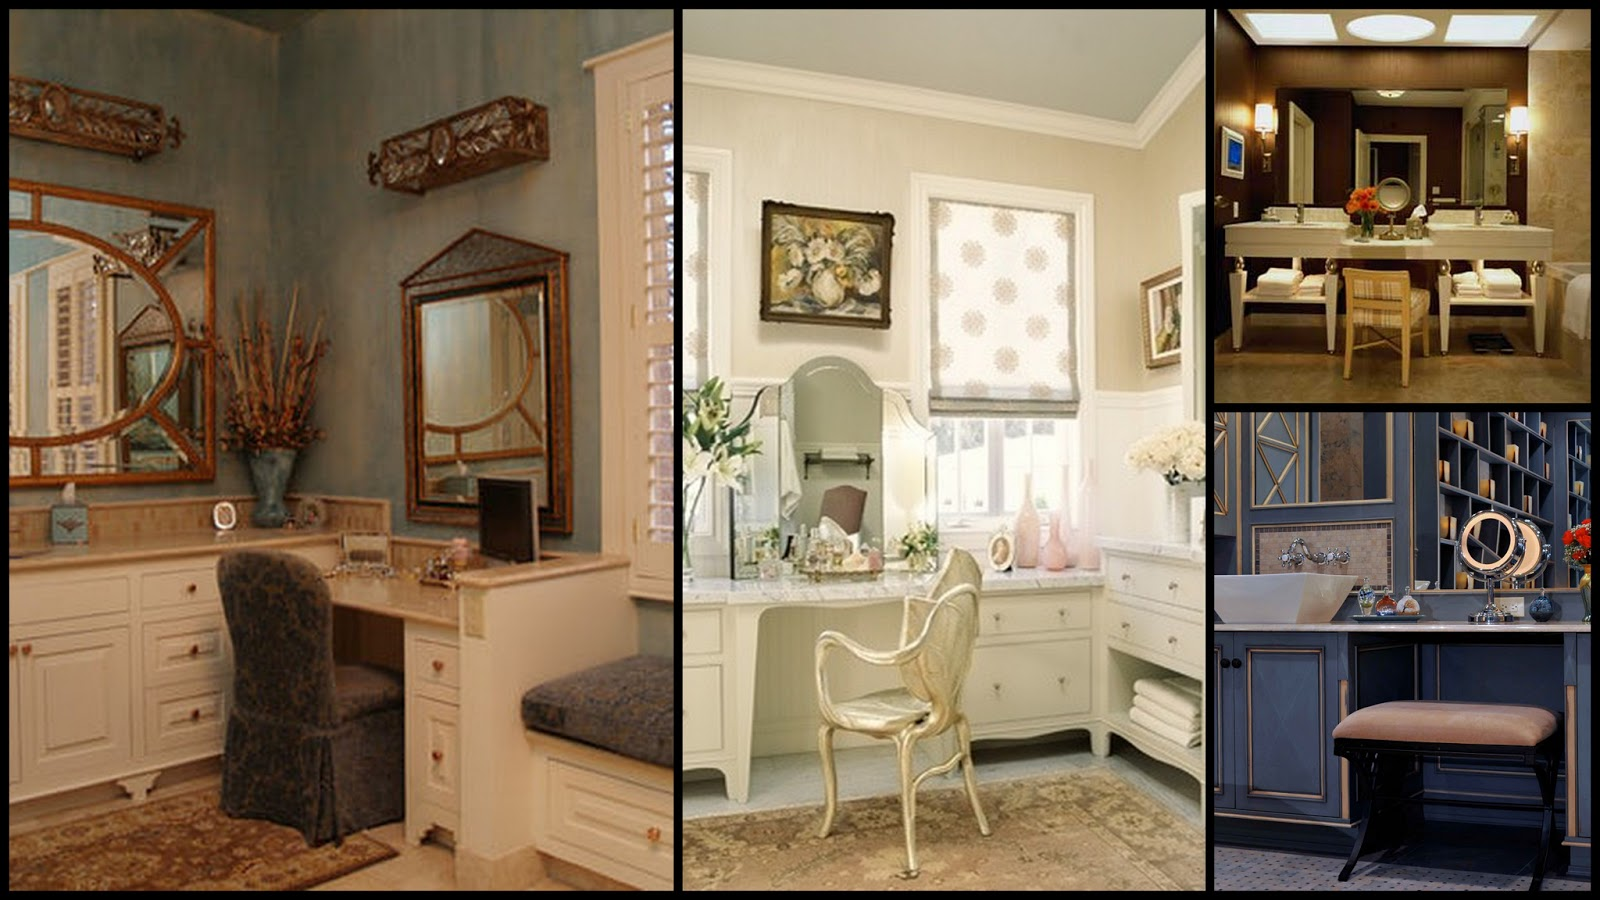 salle de bain avec coiffeuse perfect salle de bain avec coiffeuse with salle de bain avec. Black Bedroom Furniture Sets. Home Design Ideas